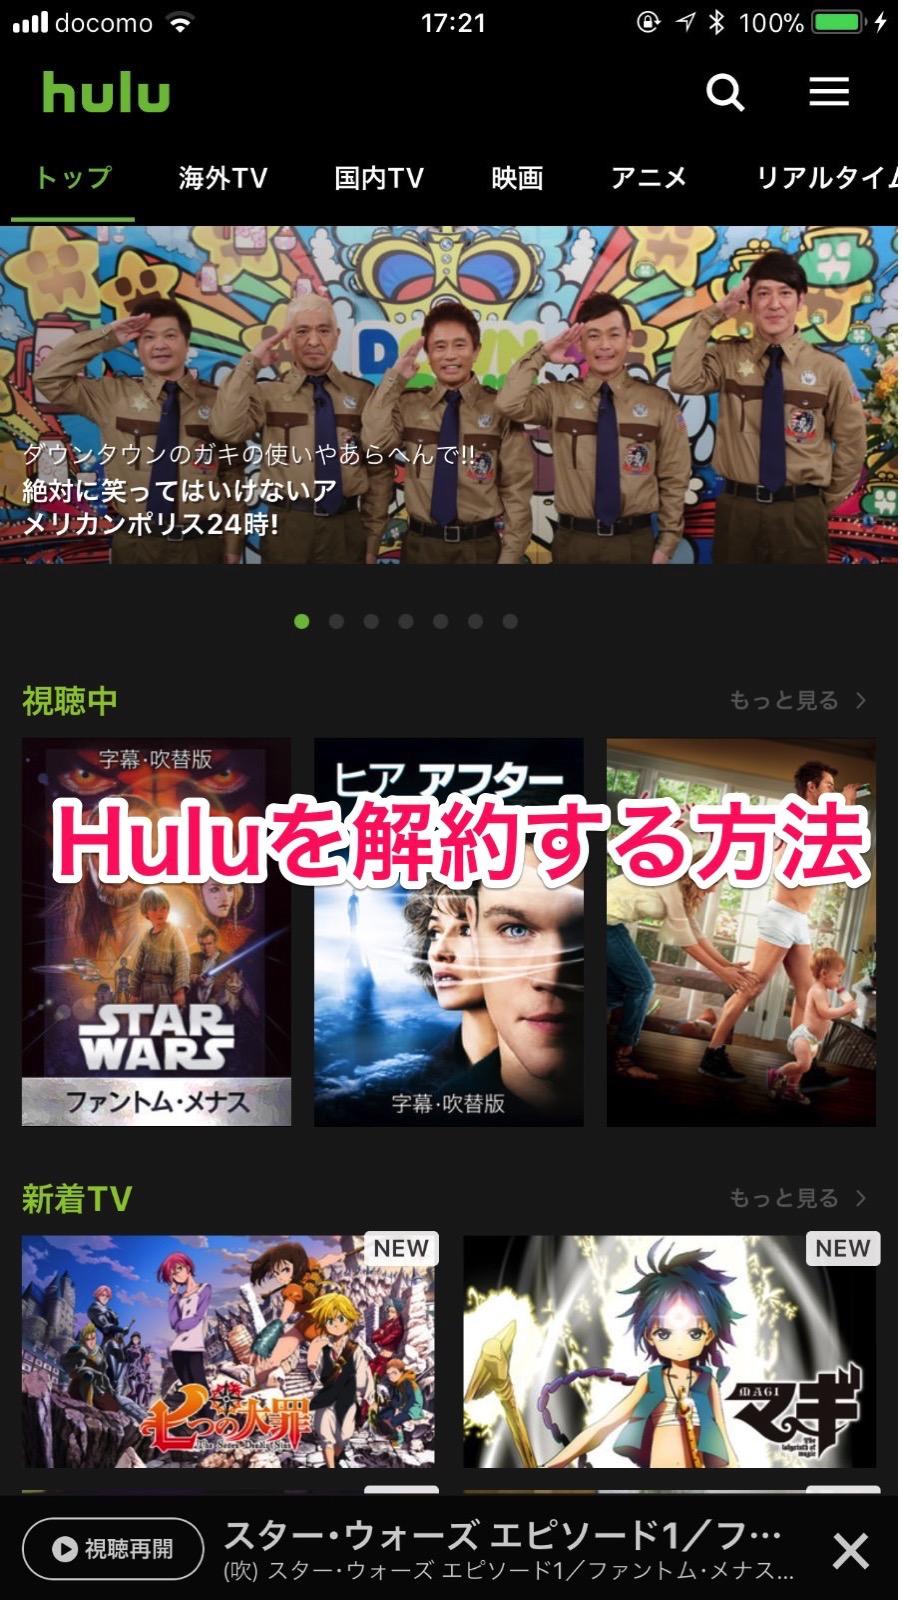 【Hulu】解約方法